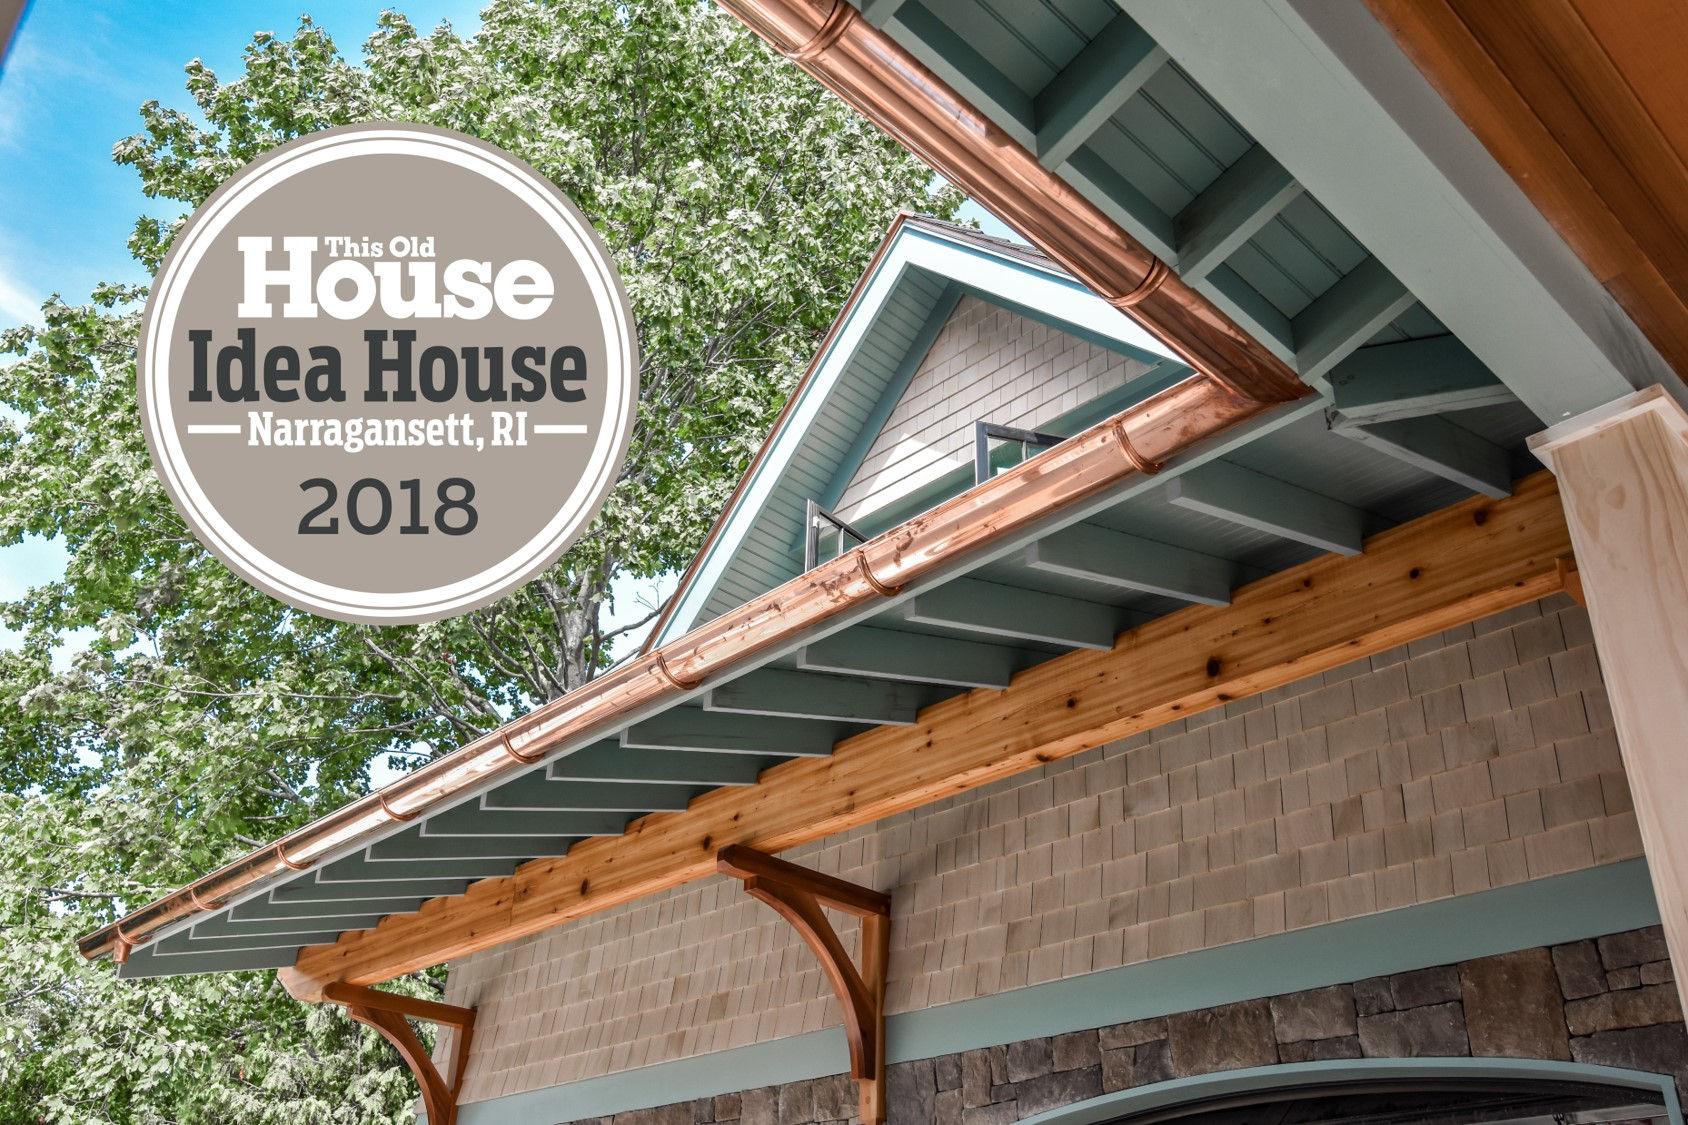 2018 Idea House Opening Celebration In Narragansett Ri